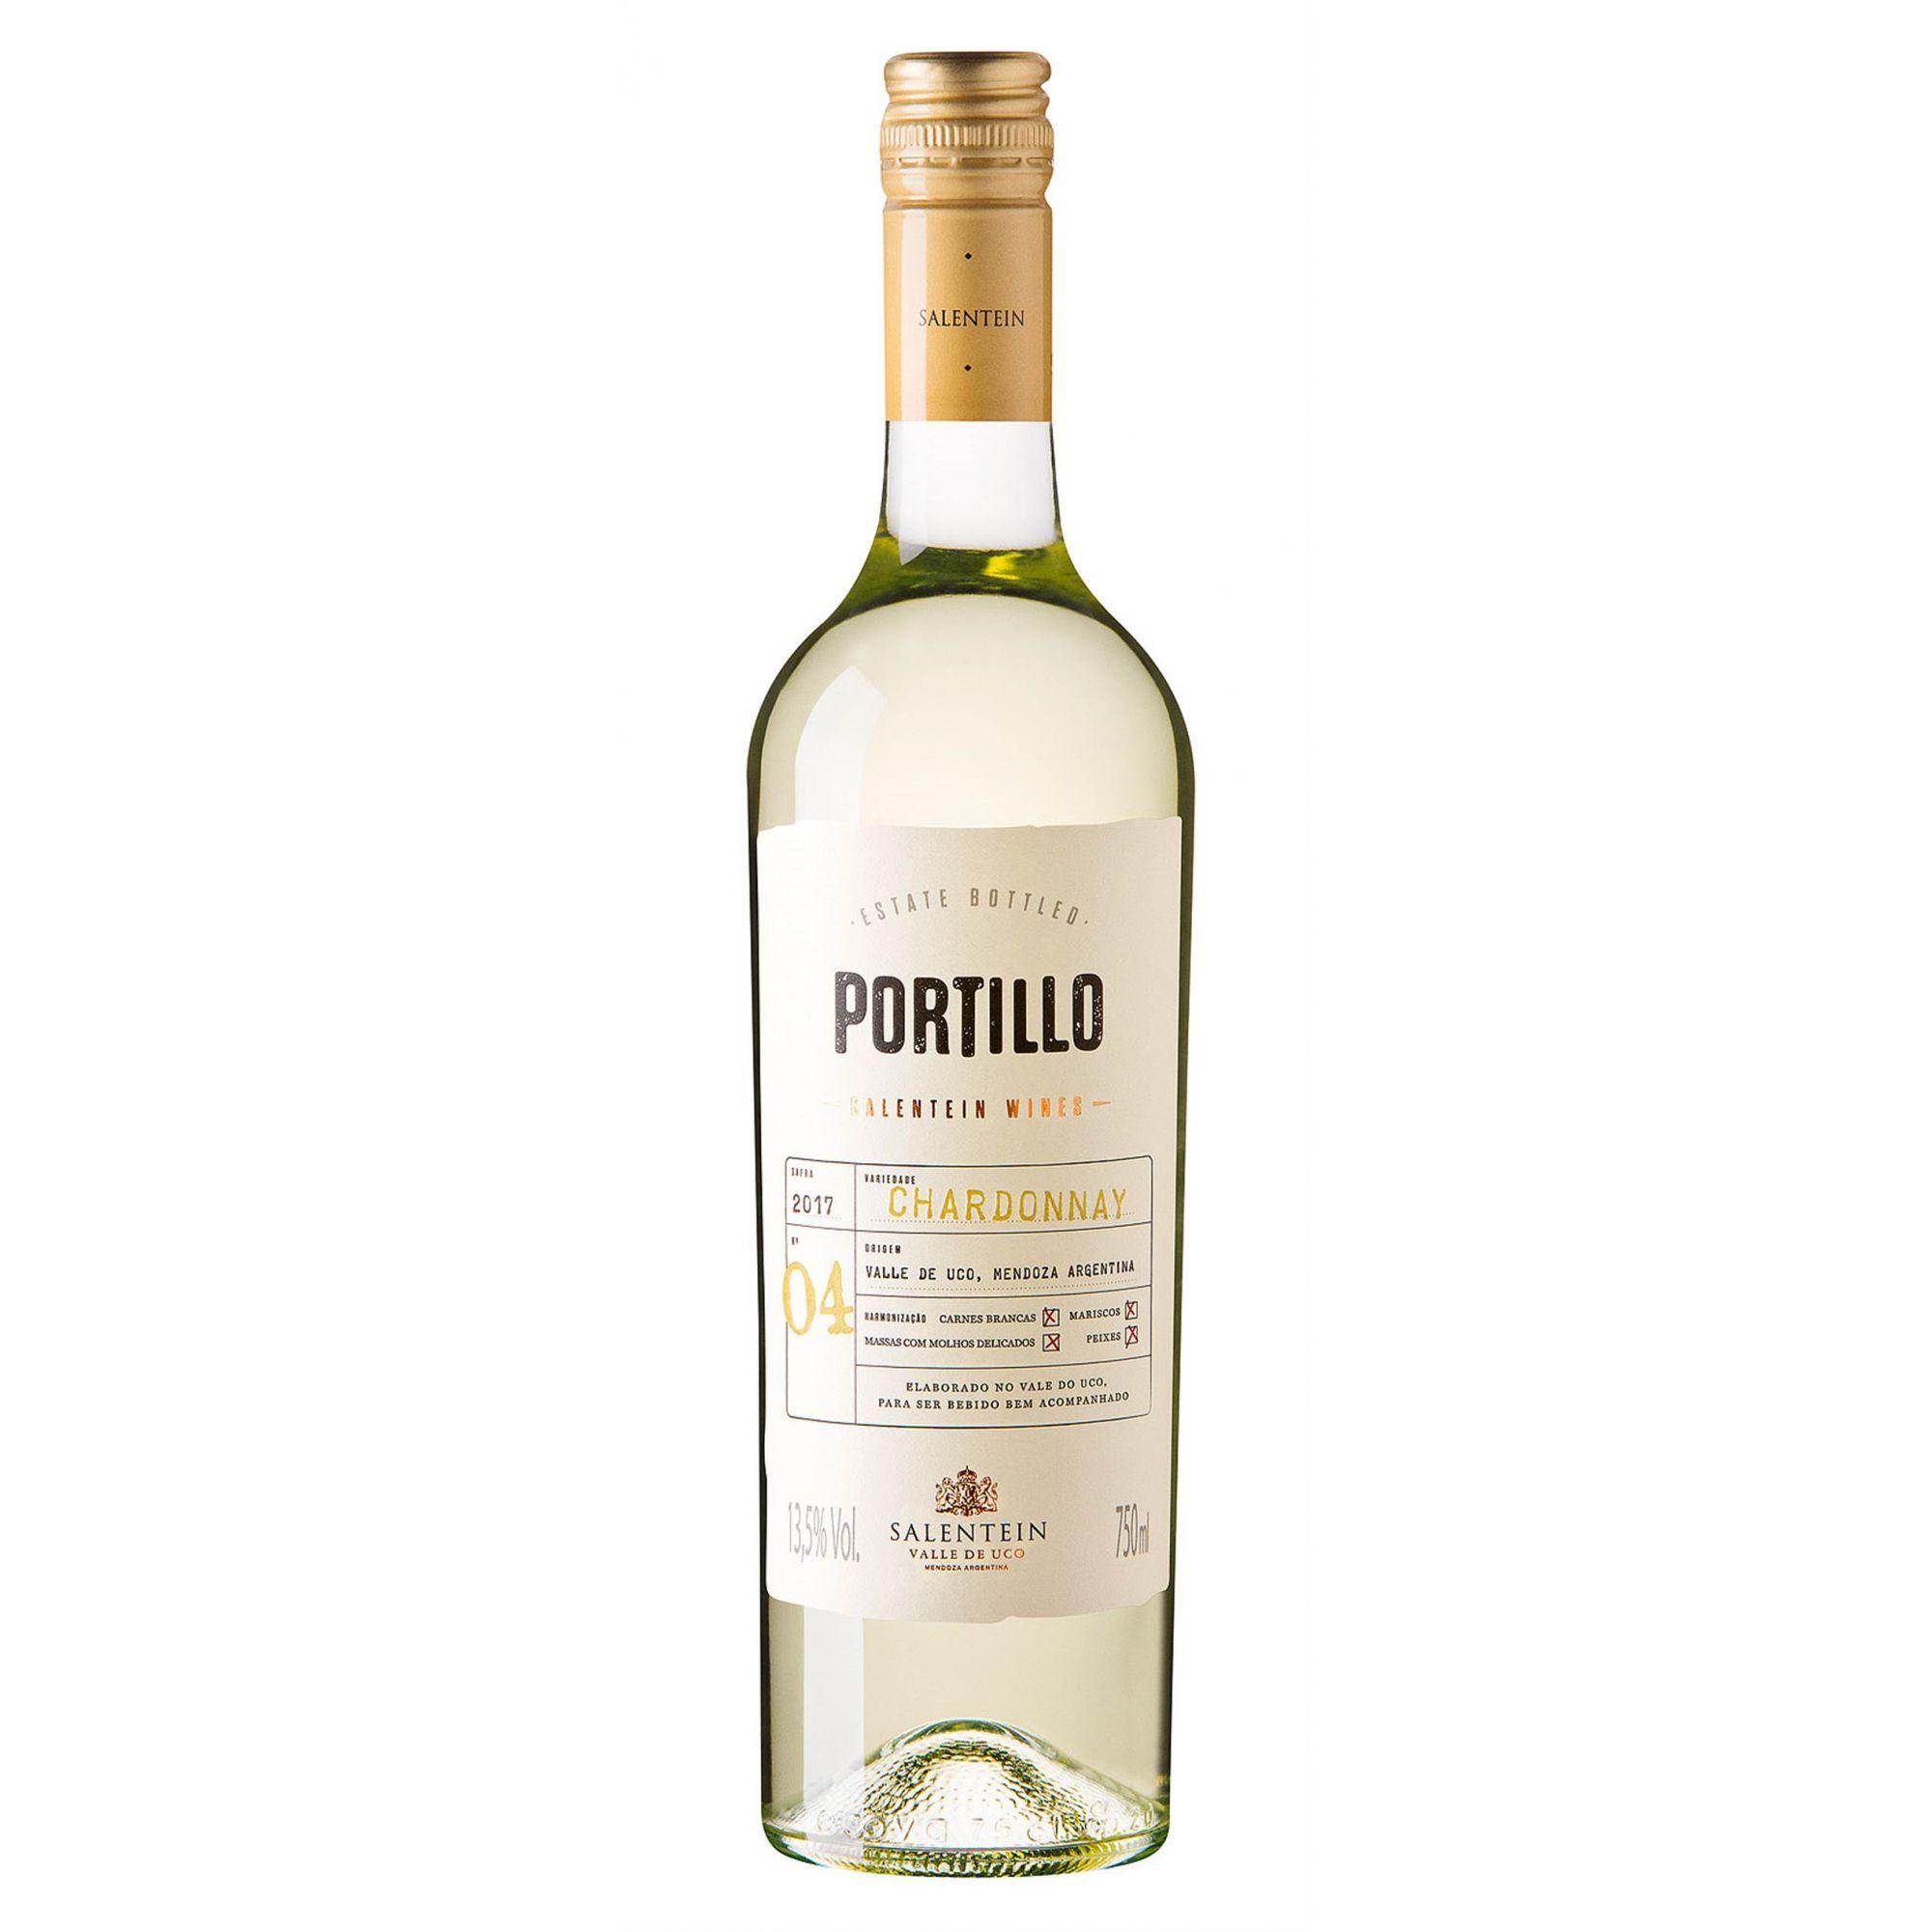 Salentein Portillo Chardonnay 750ml